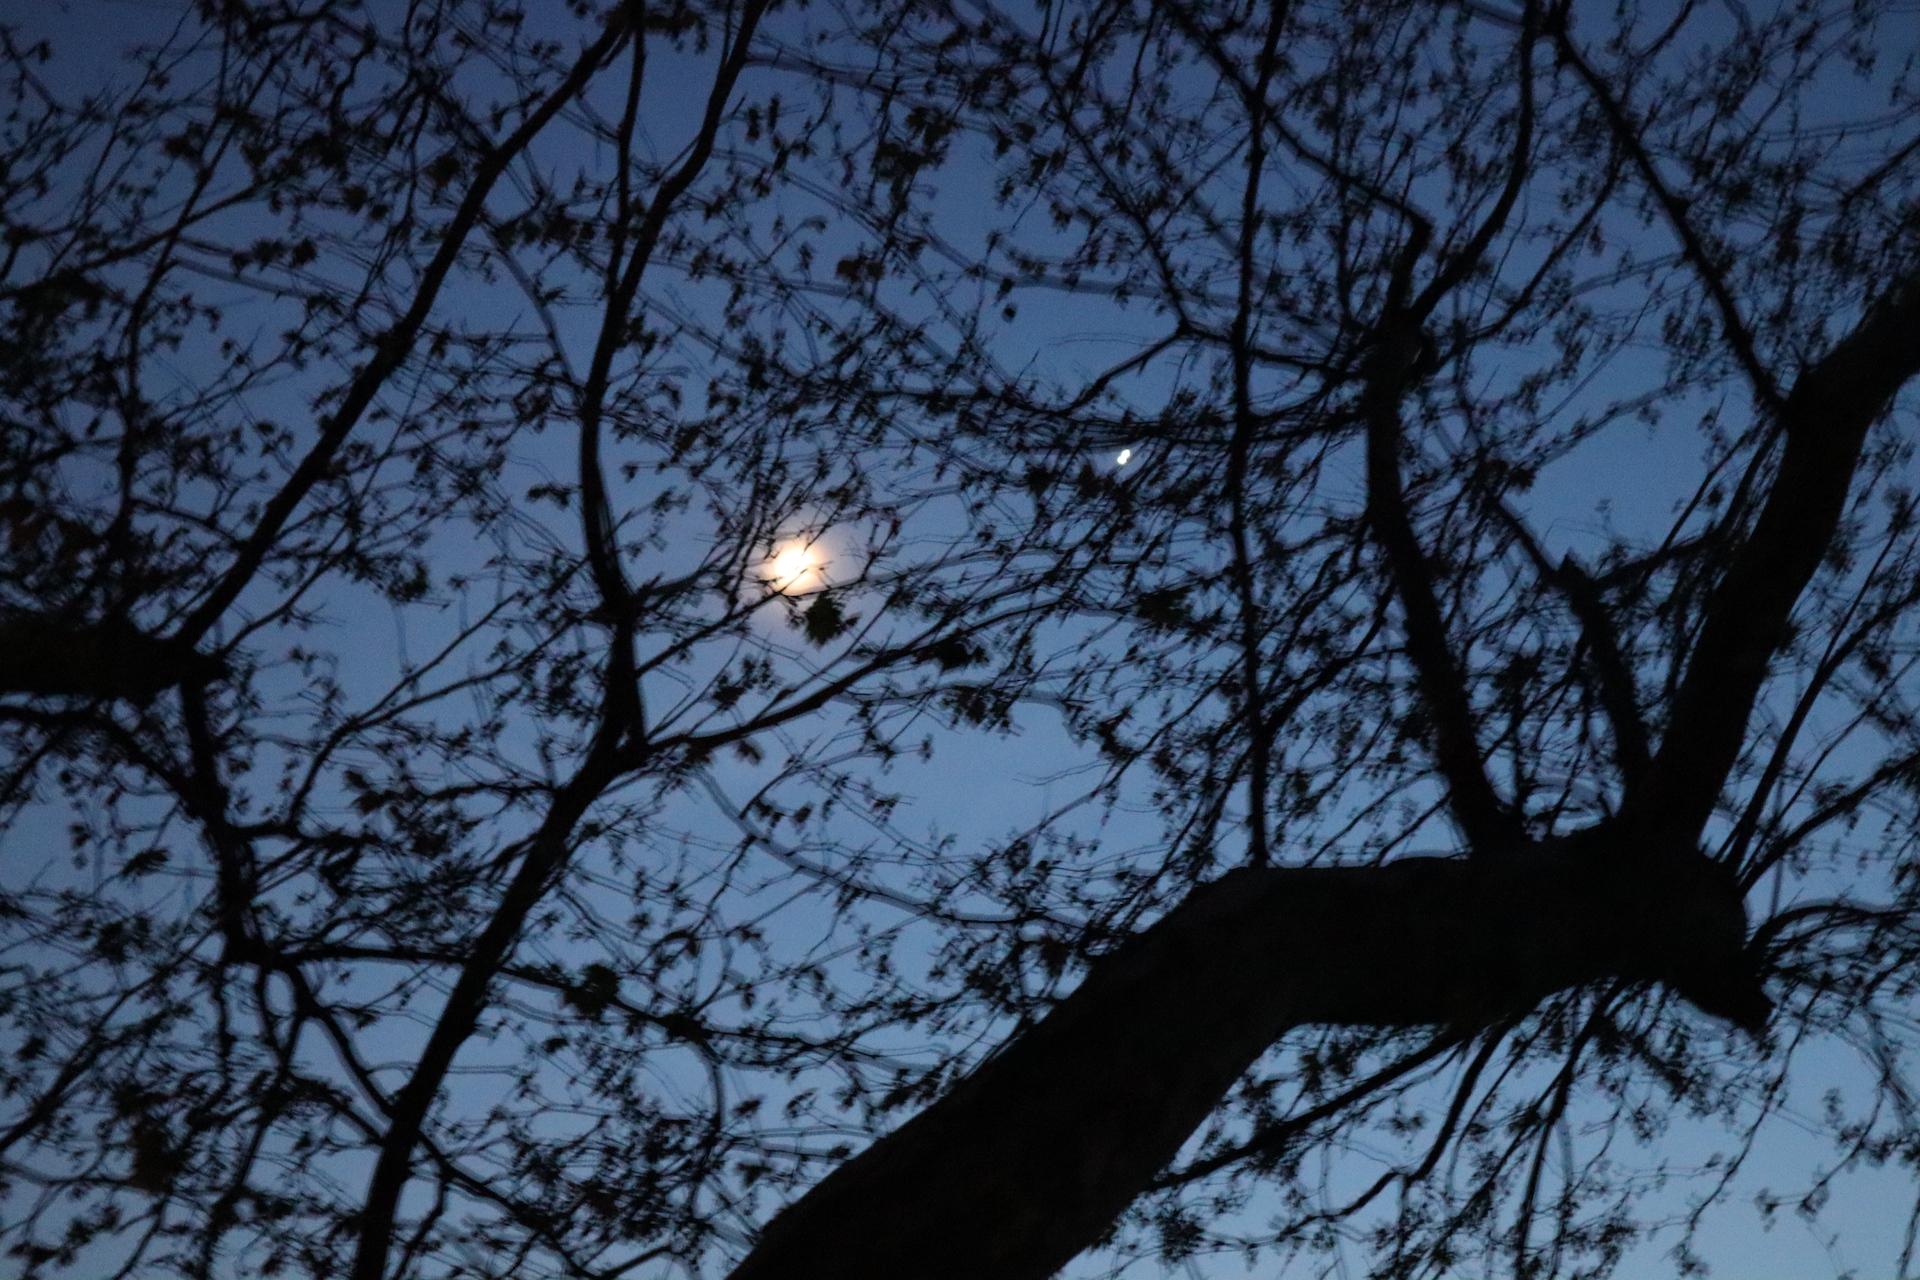 BLEU 9 (Ciel du soir) - Blandine Armand - série photos